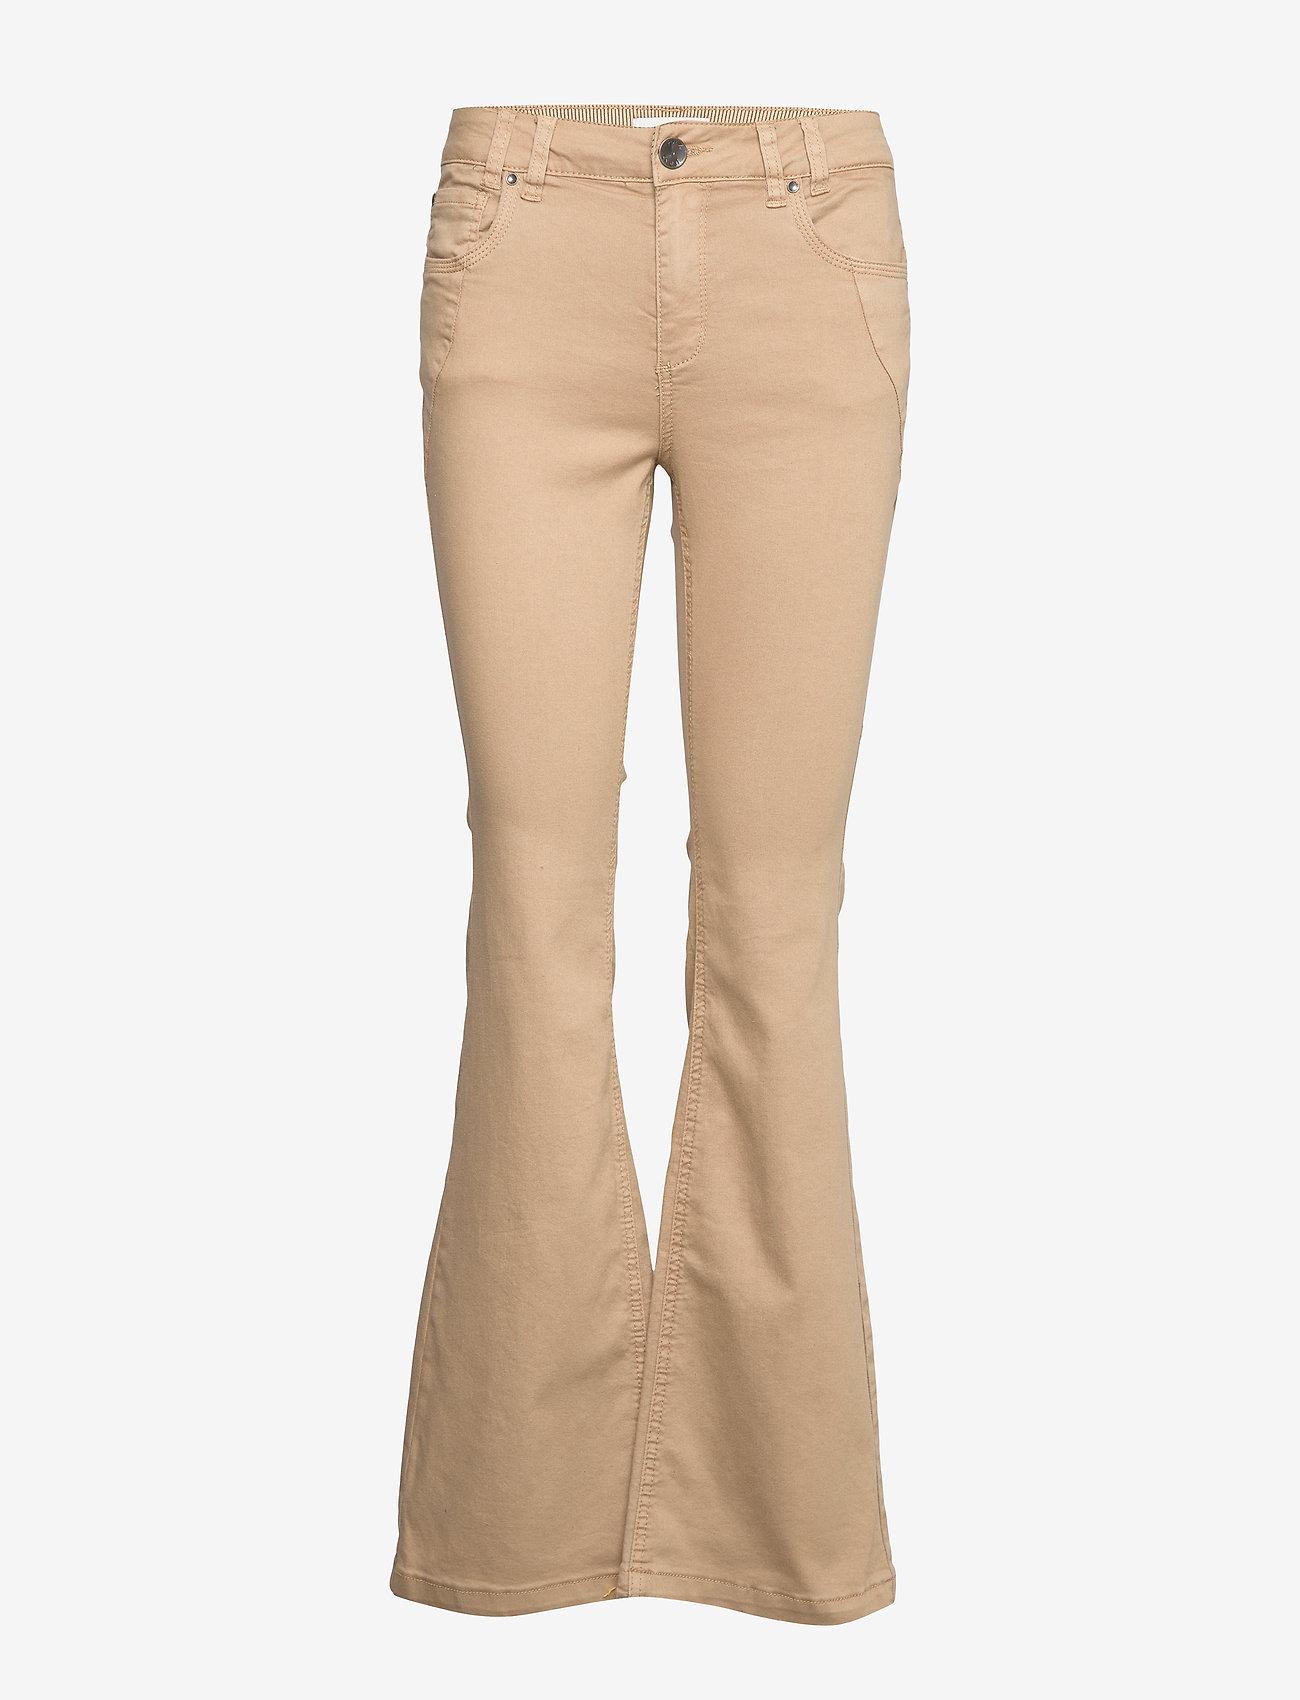 Pulz Jeans - PZRITA Pant - schlaghosen - tannin - 0